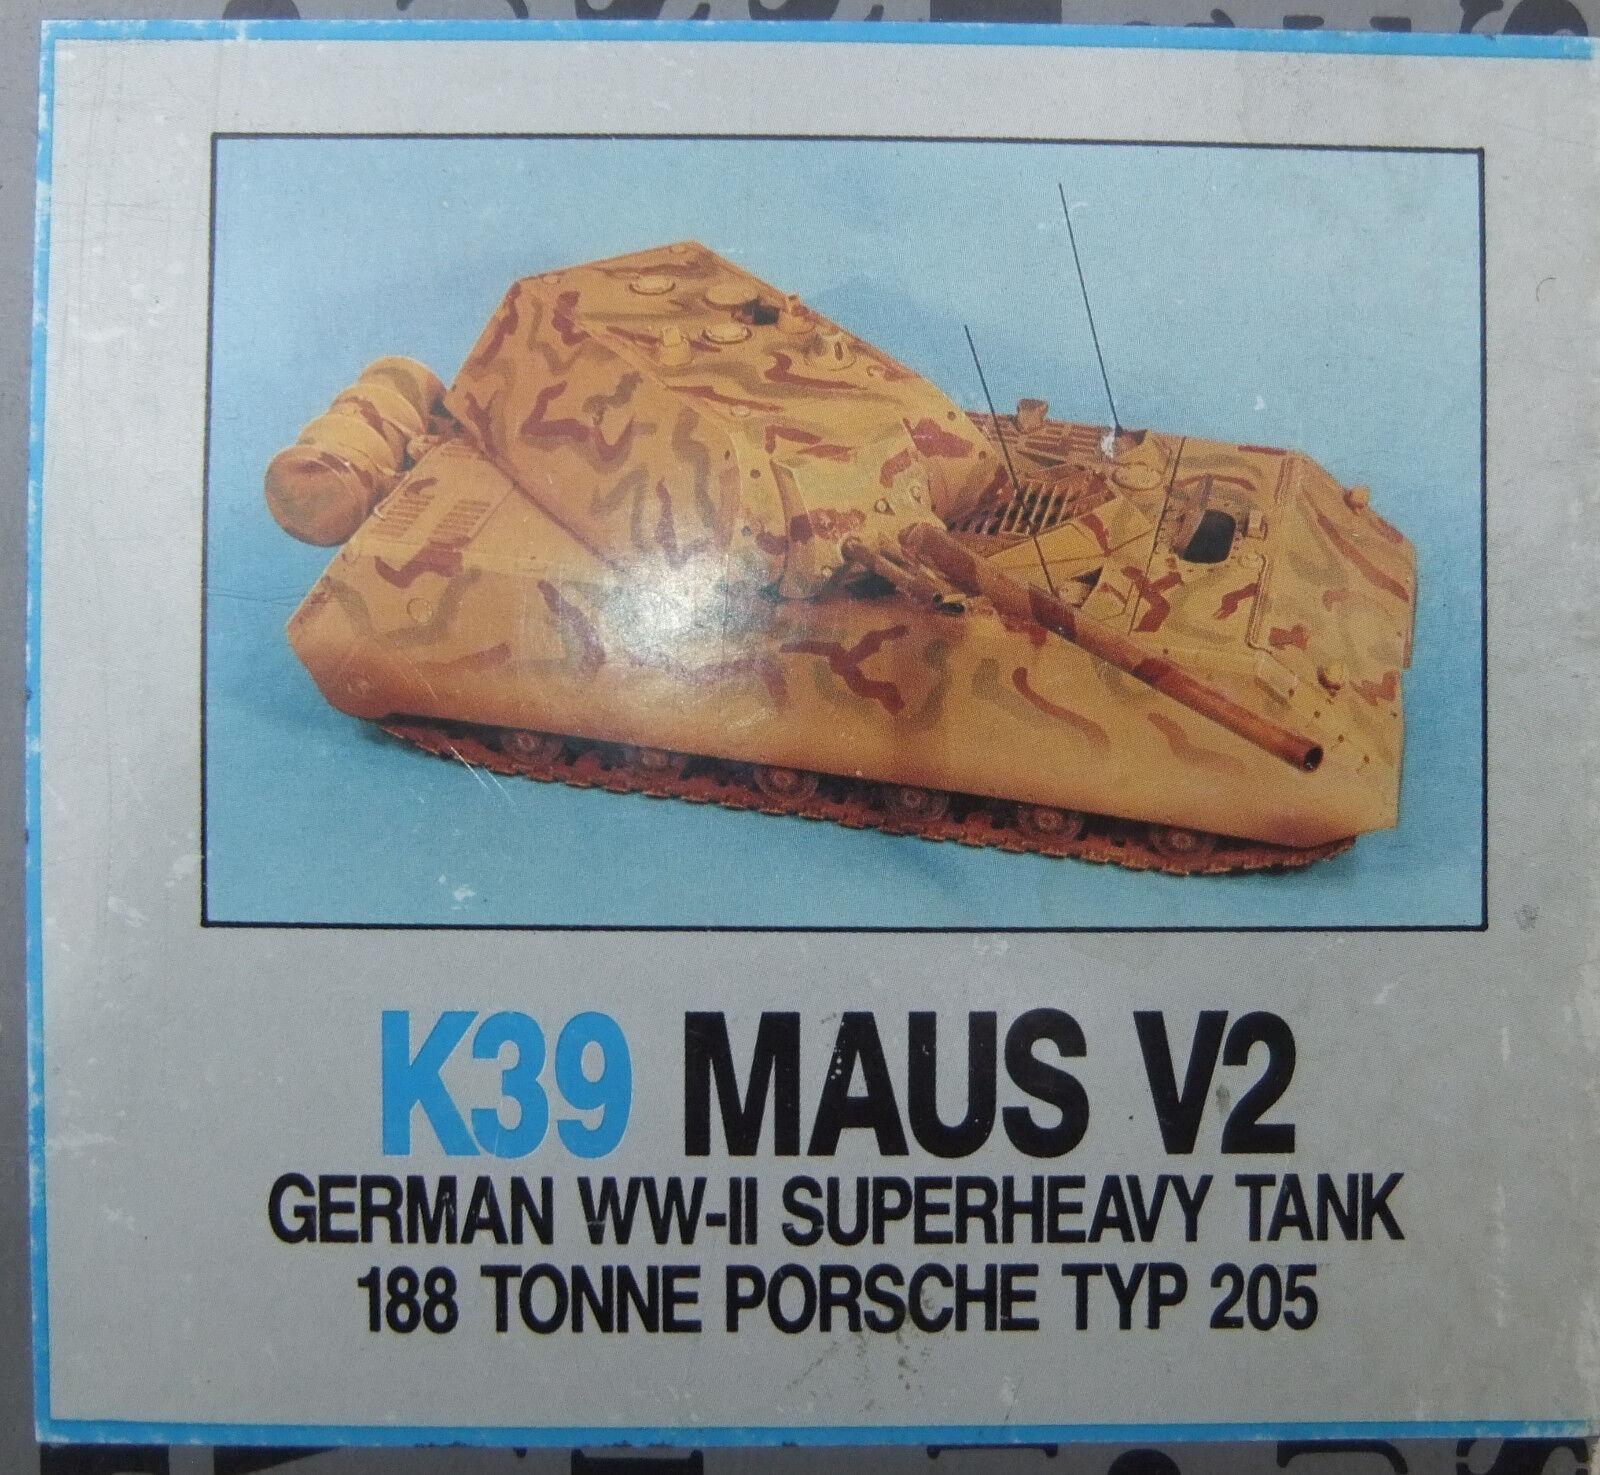 ACCURATE ARMOR K39 - MAUS V2 German Tank SUPER HEAVY SERIES - 1 35 RESIN KIT  | Verkaufspreis